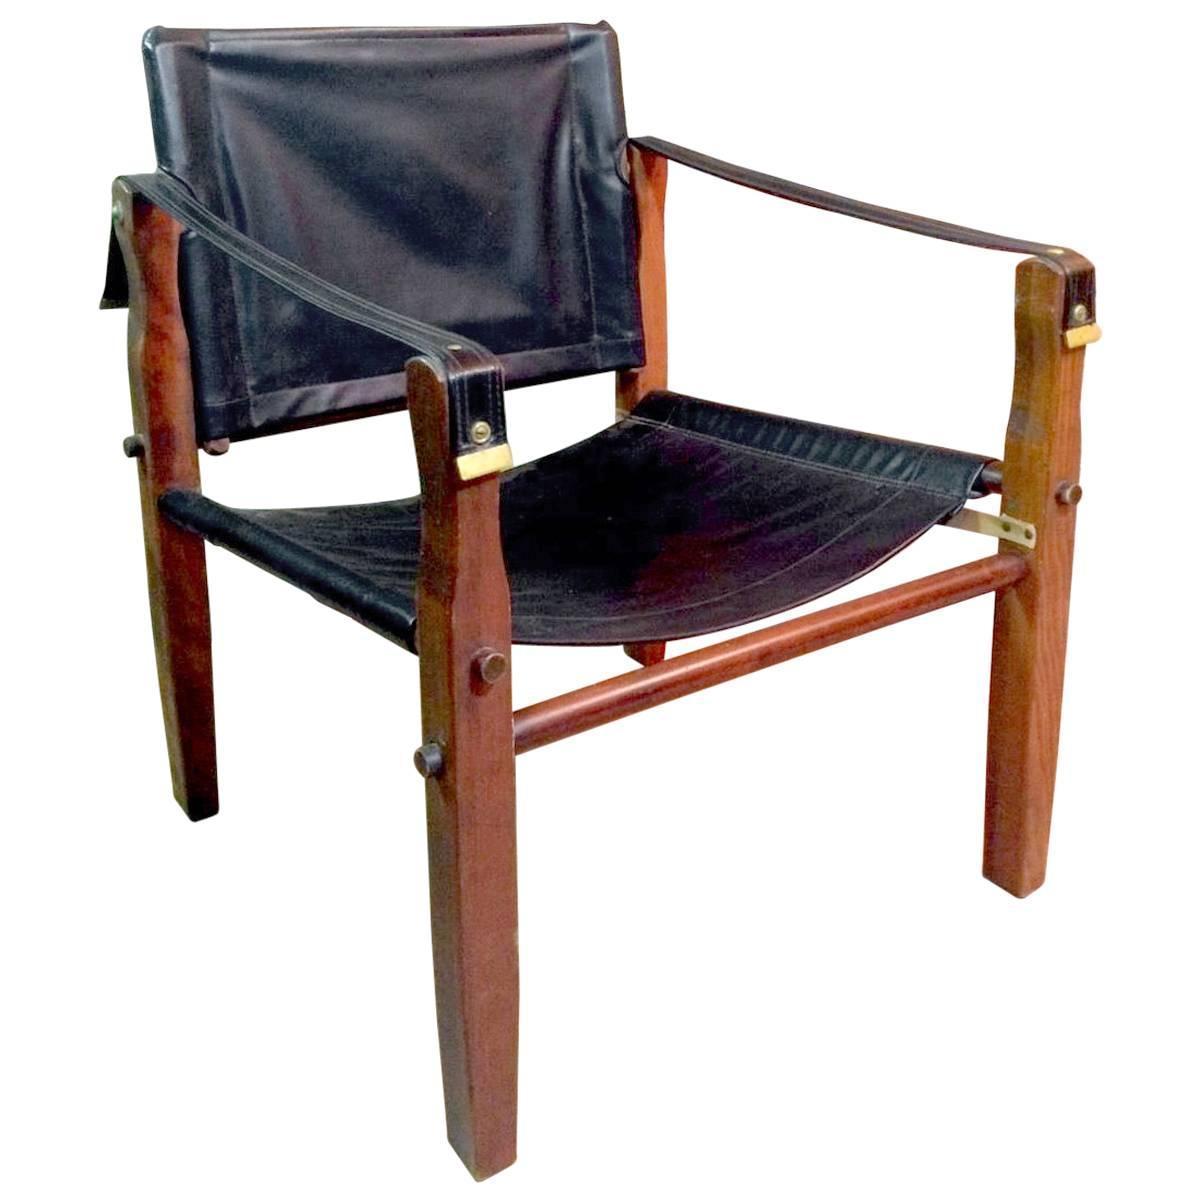 Wonderful Gold Medal Safari Chair For Sale At 1stdibs